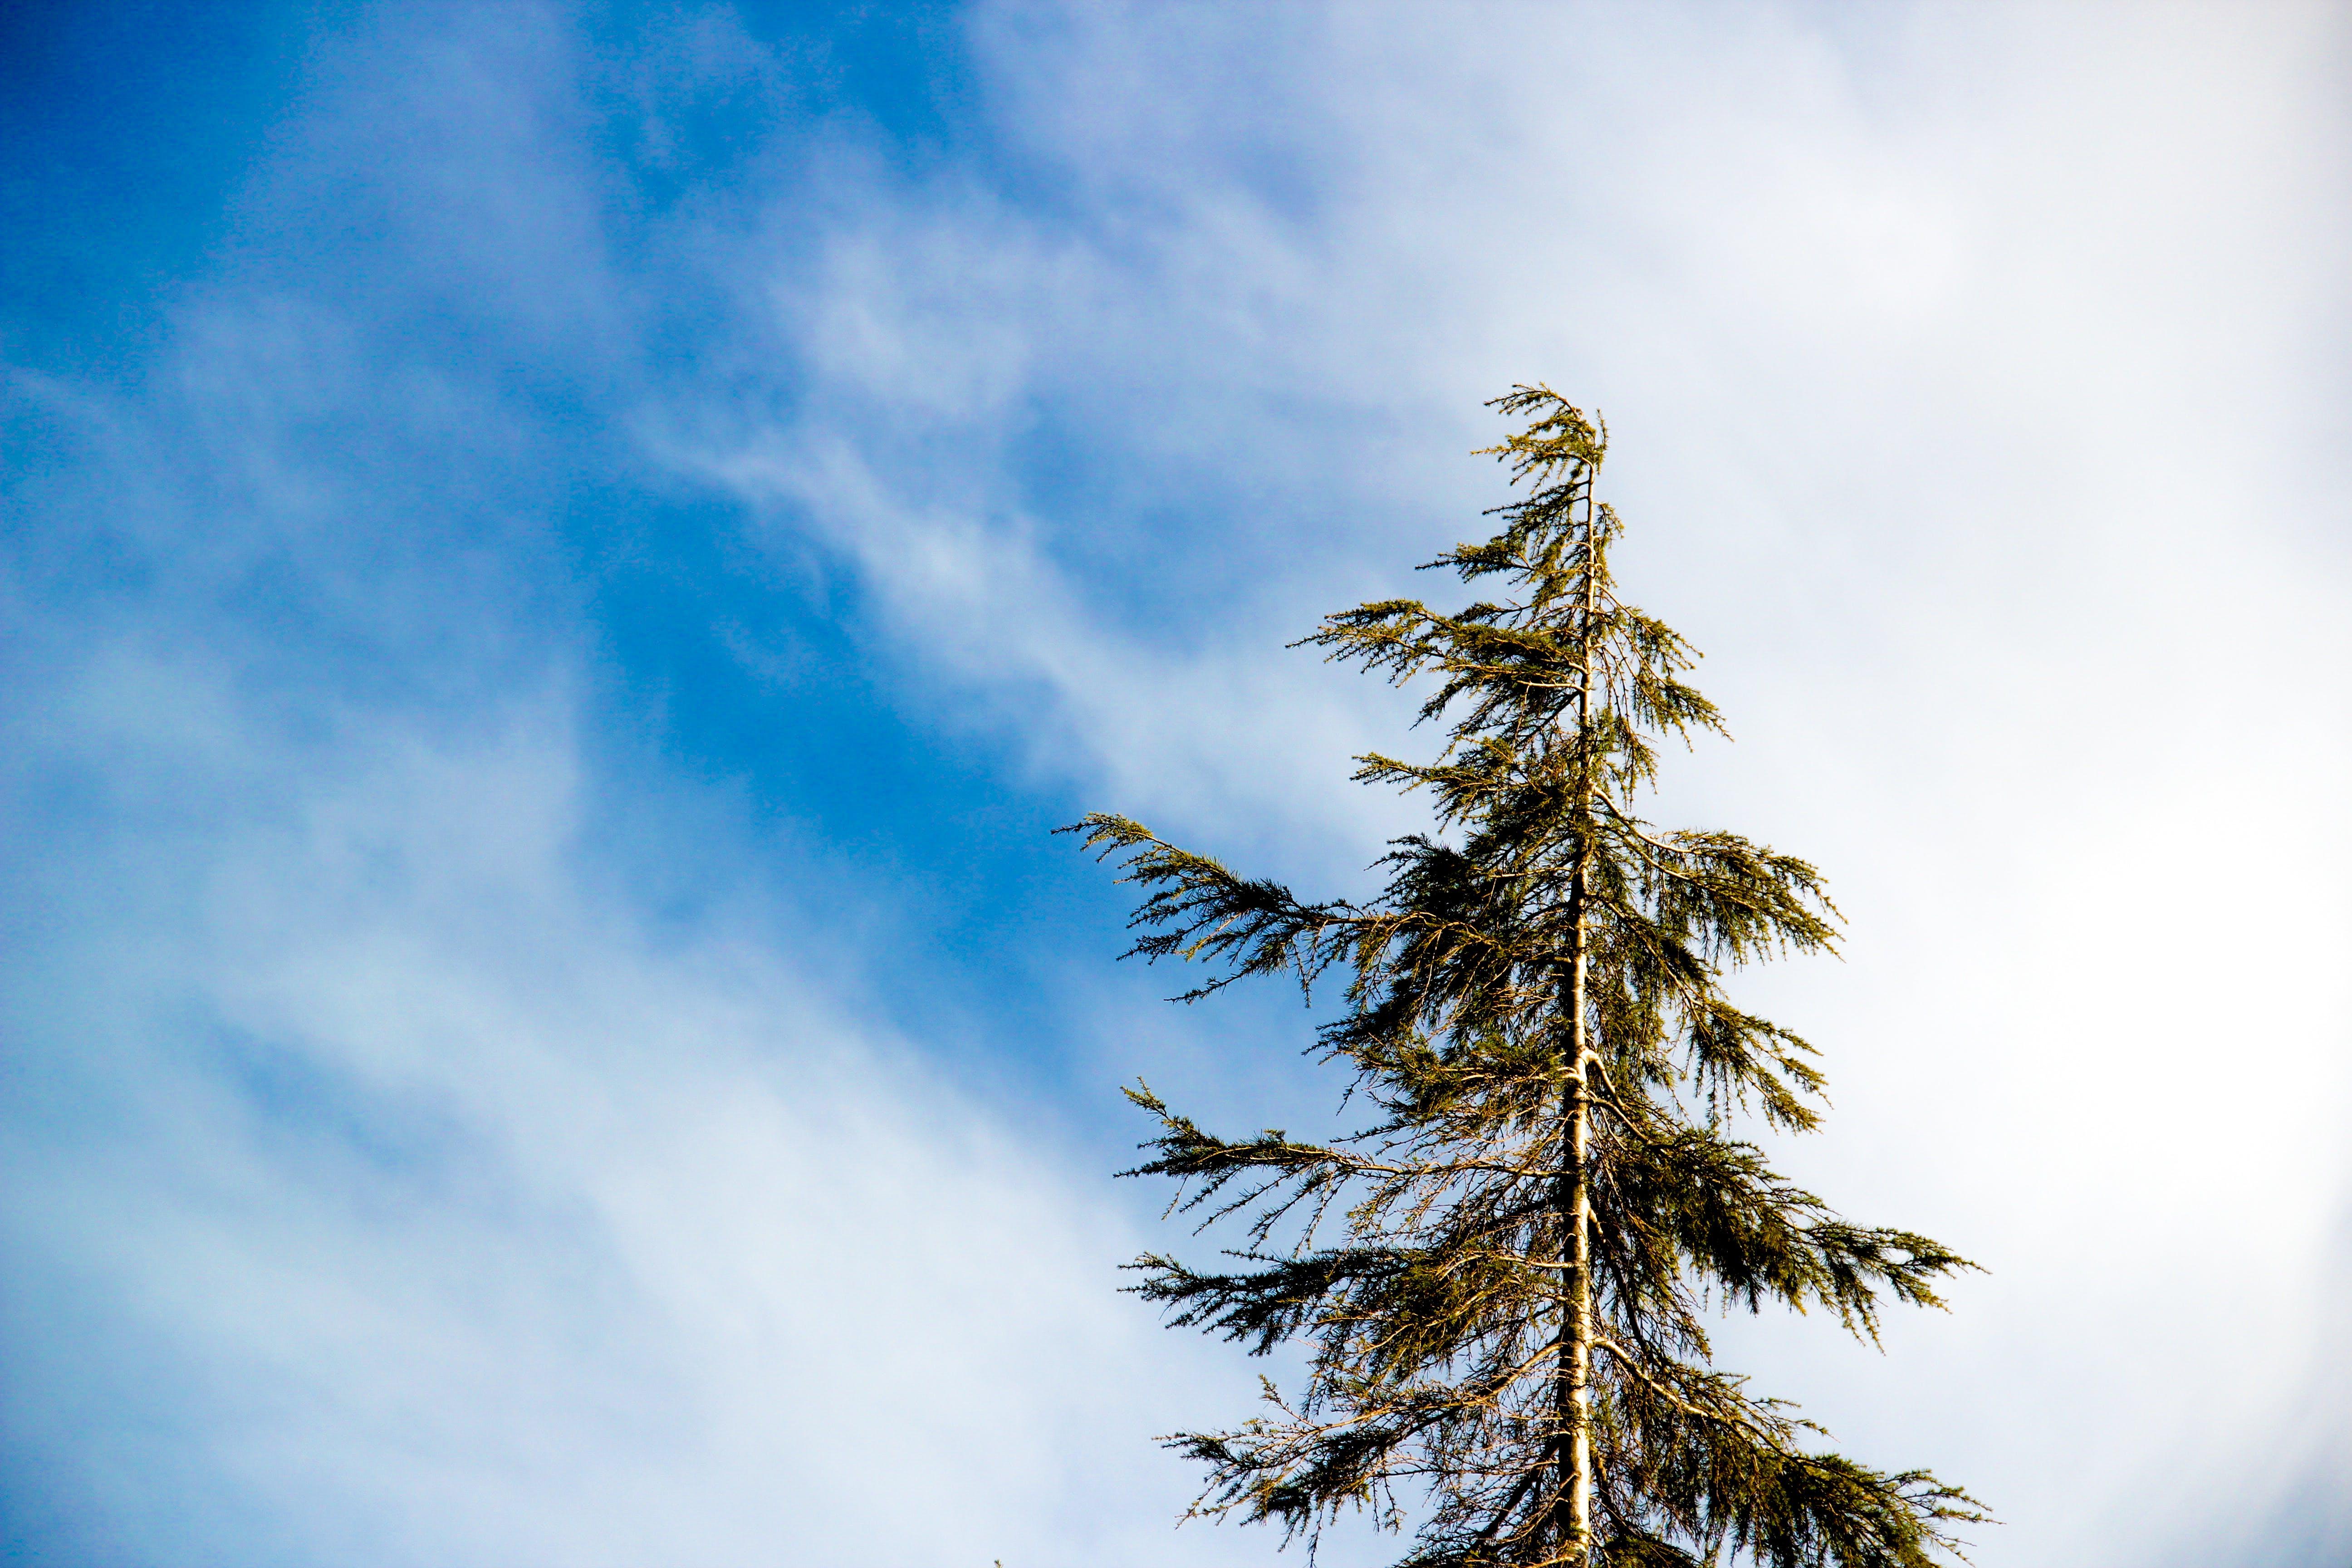 Worm's Eye Photography Green Leaf Tree